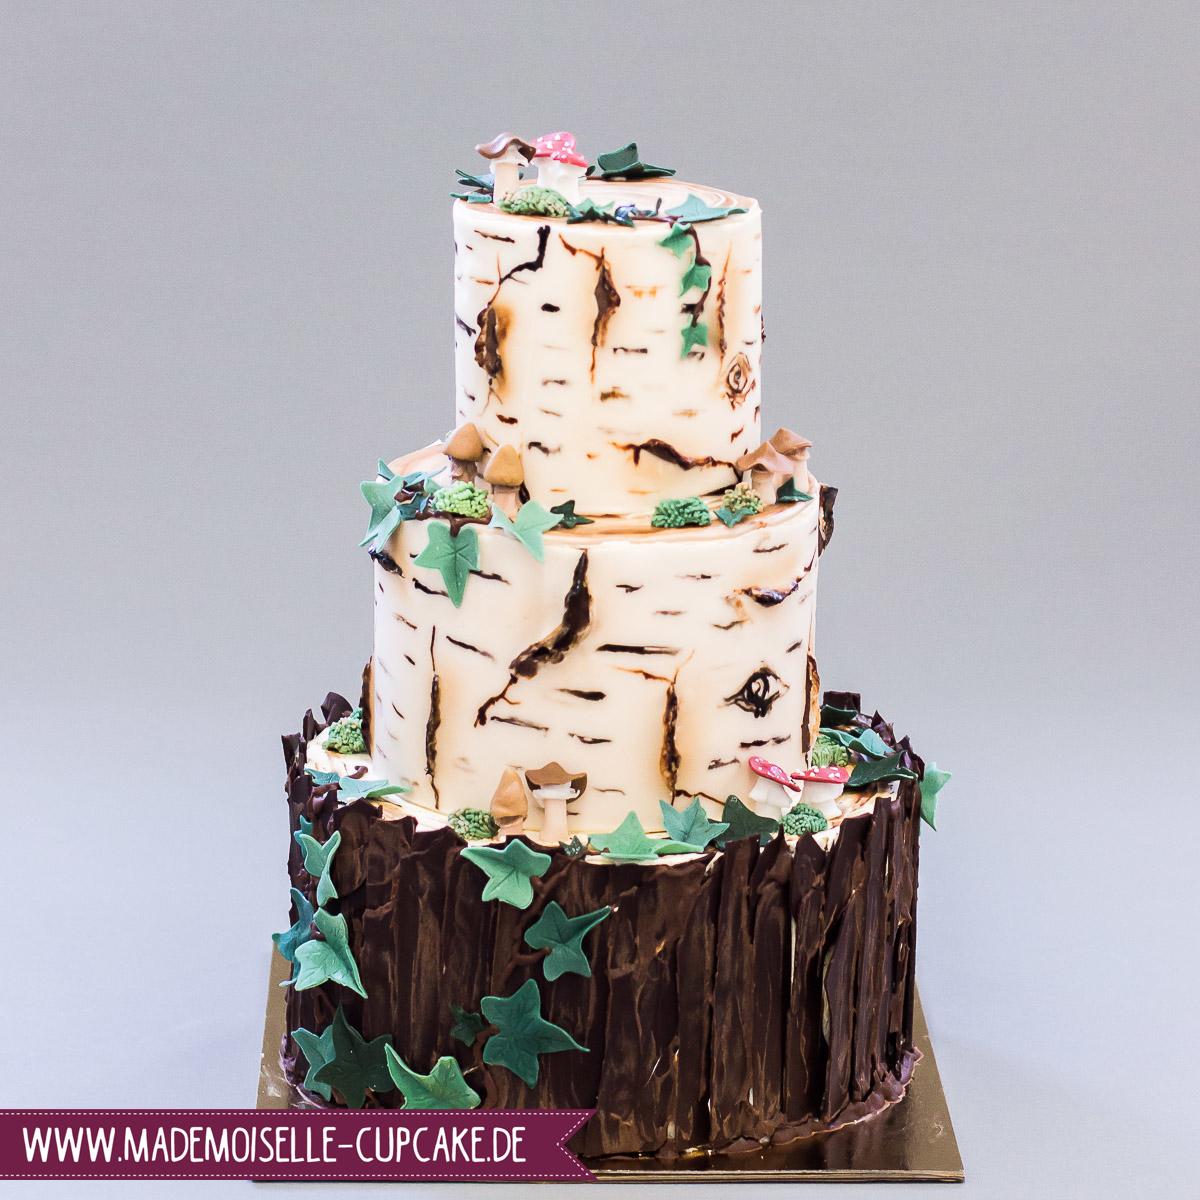 Birkenbaum Mademoiselle Cupcake